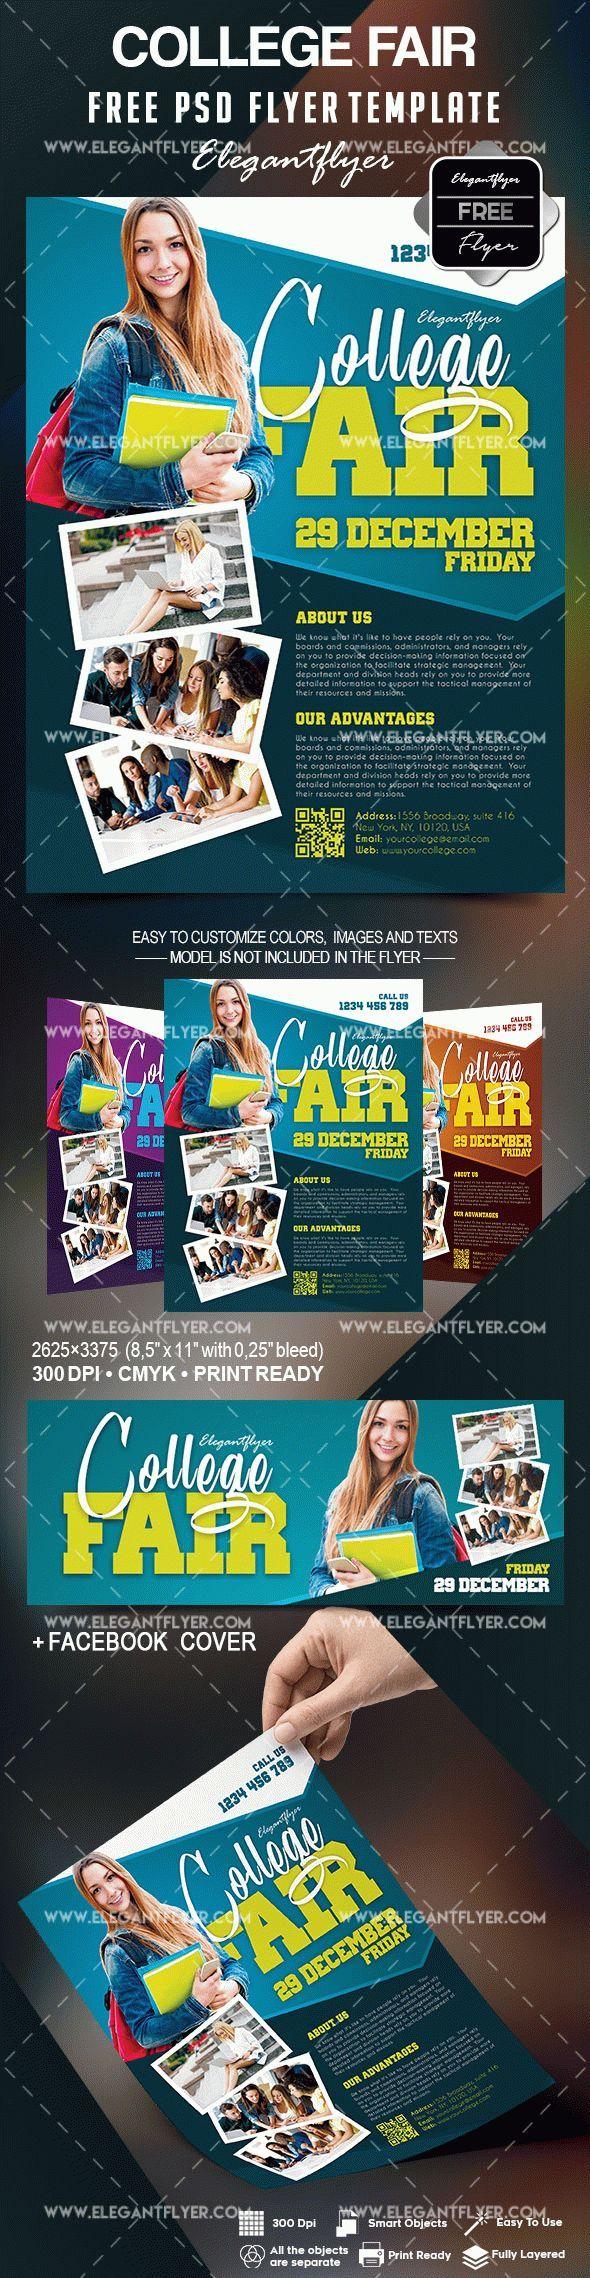 https://www.elegantflyer.com/free-flyers/free-college-fair-flyer-template/